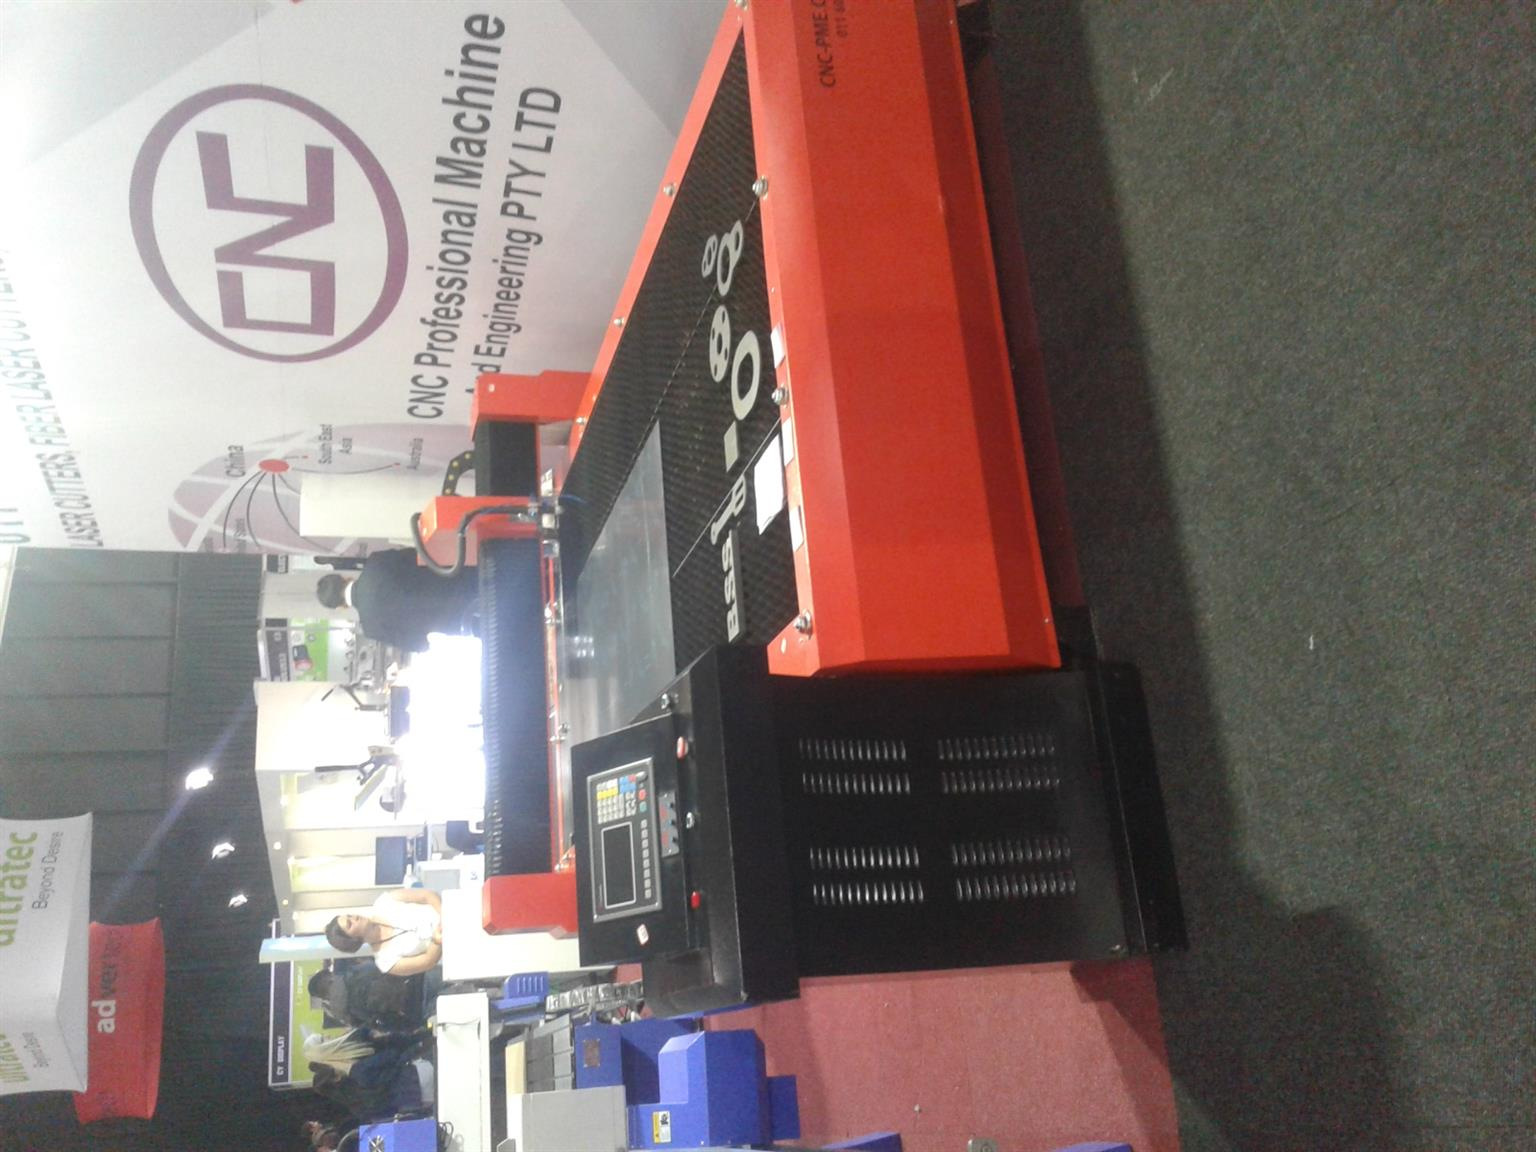 CNC Plasma cutter 1.5 m x 3 m 100 Amp